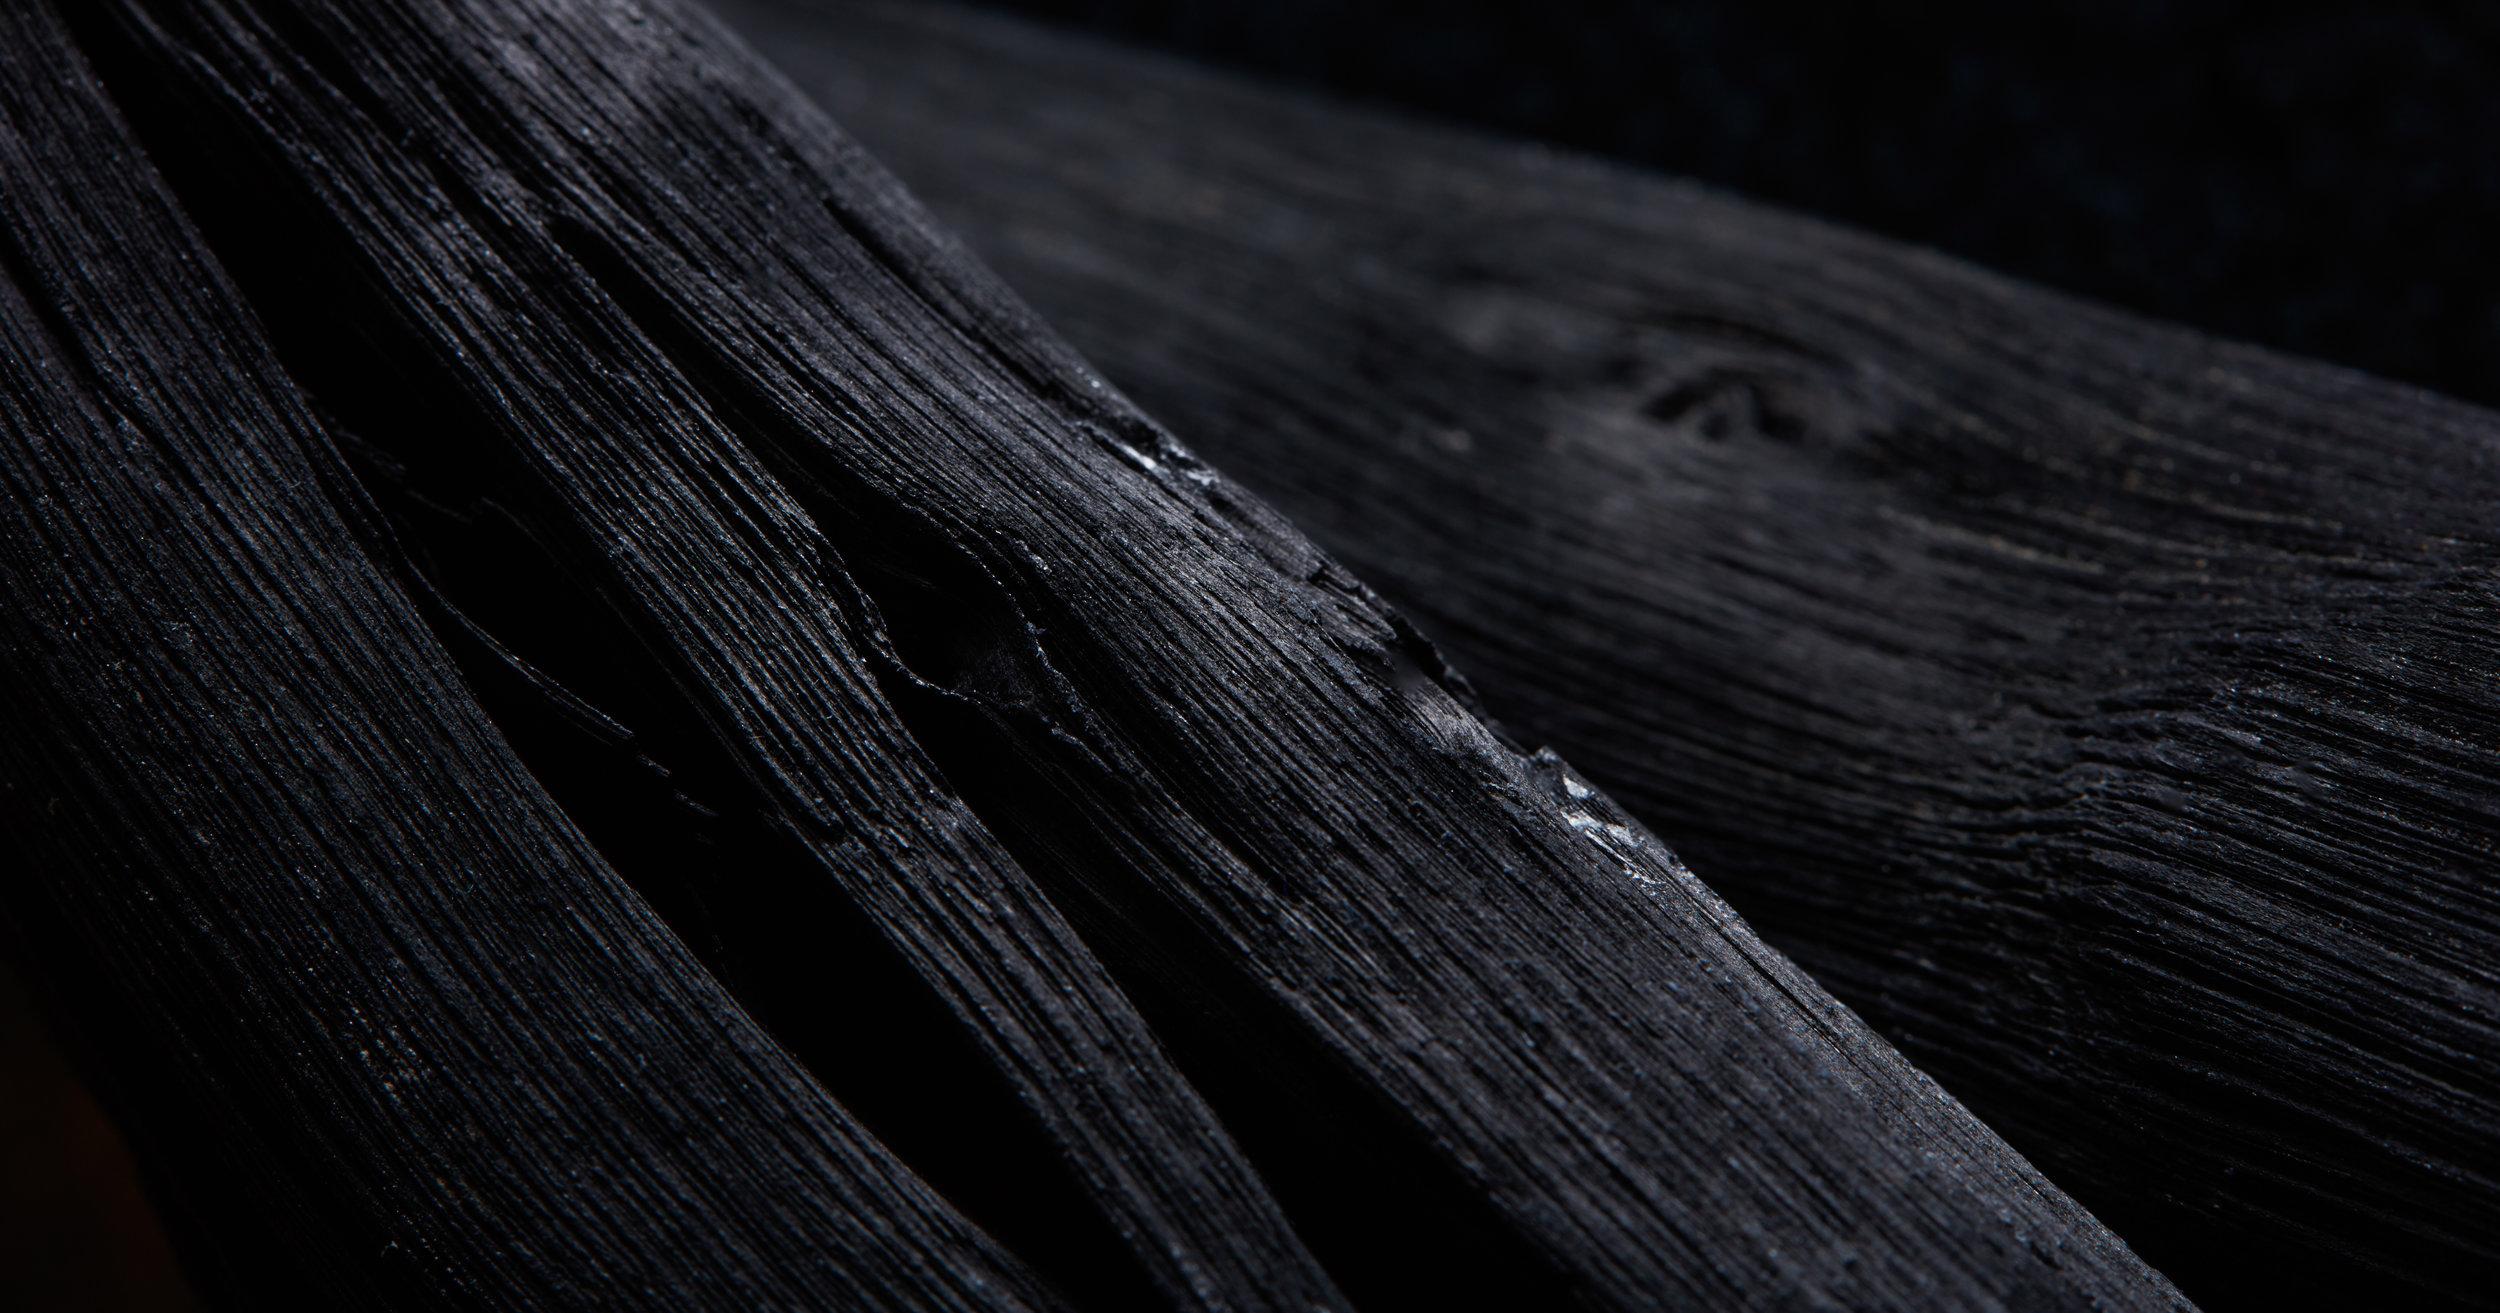 bt_journal_charcoal-detox_01.jpg